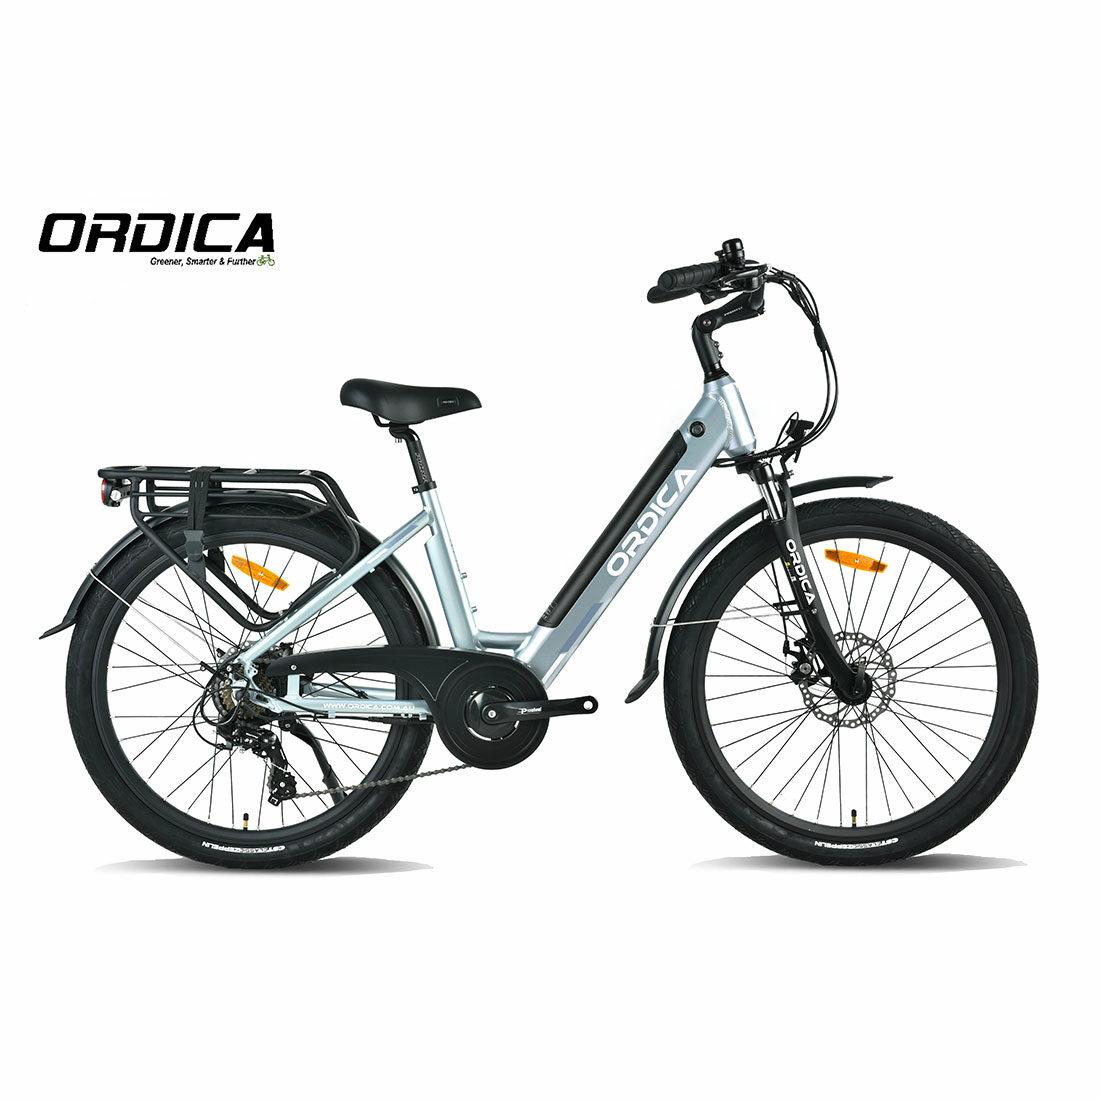 Ordica Swift 26 Inch Blue